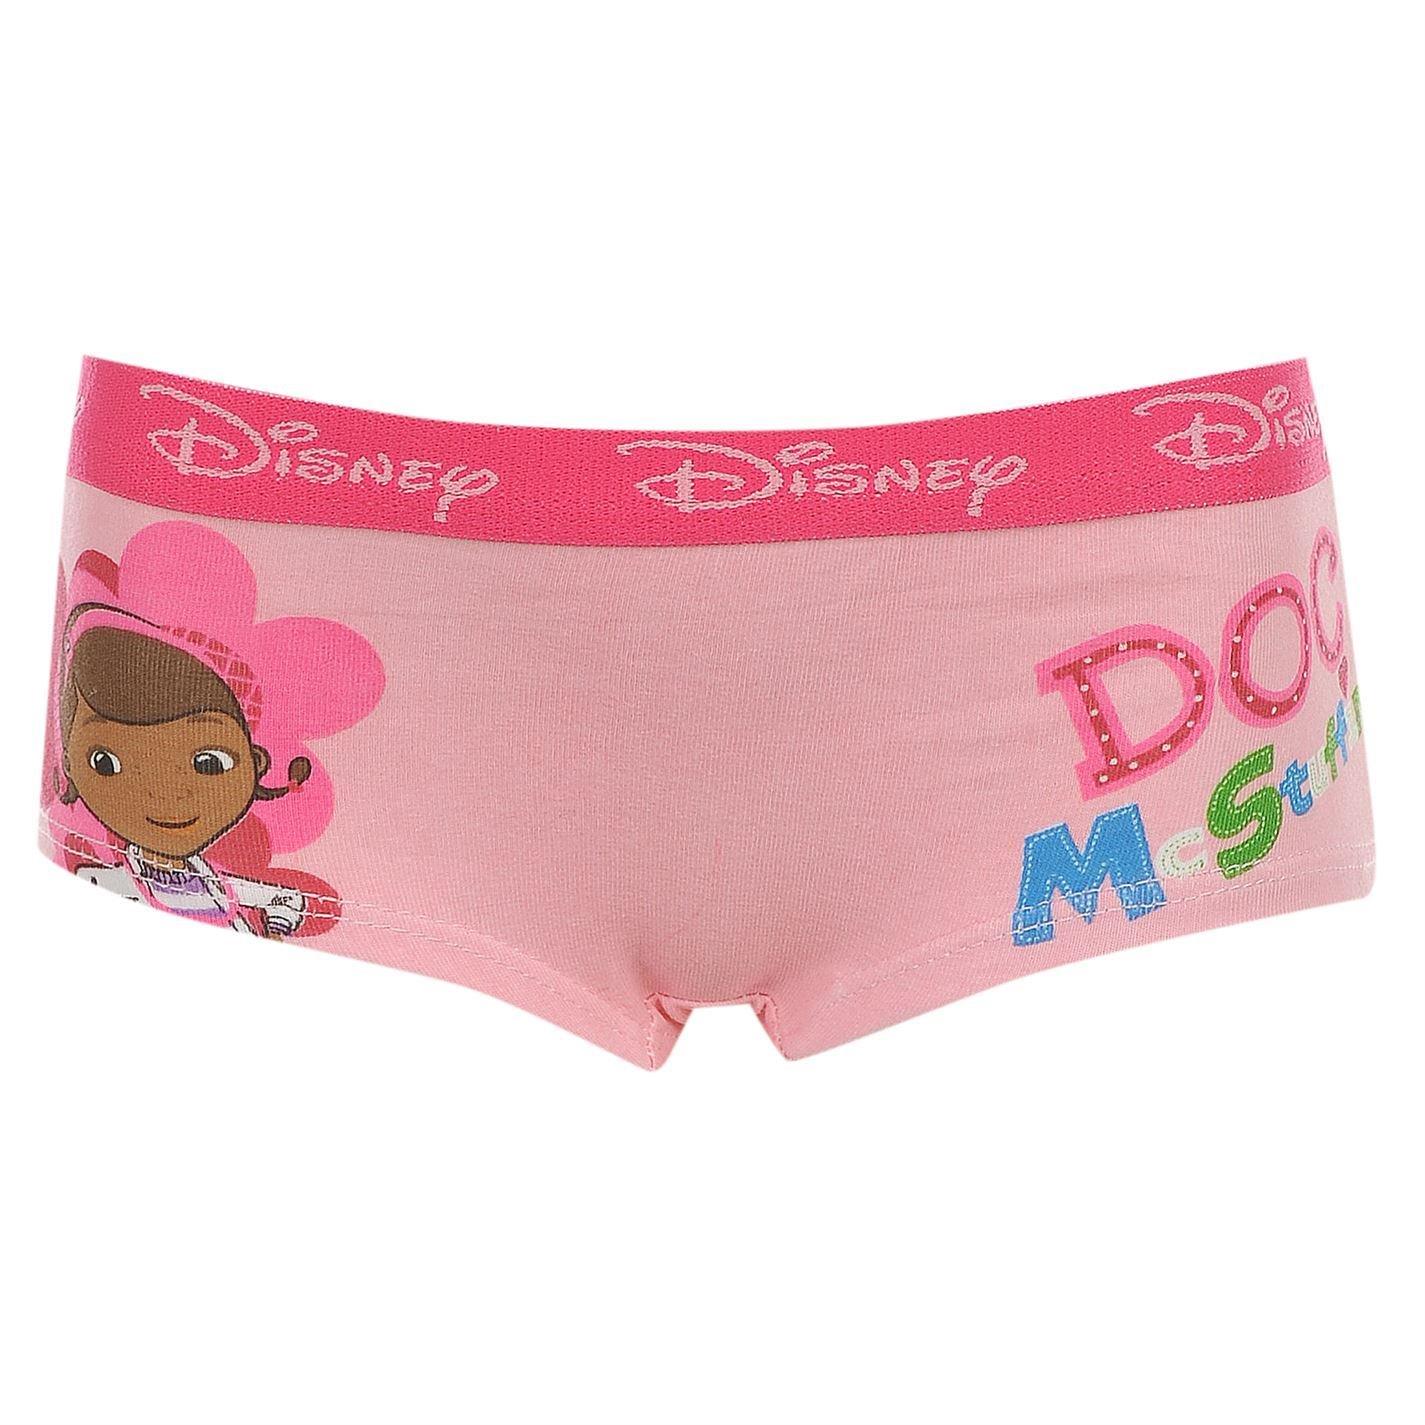 Disney Doc McStuffins Boxer Slip ropa interior Niñas Rosa/Multi Tanga bragas: Amazon.es: Deportes y aire libre